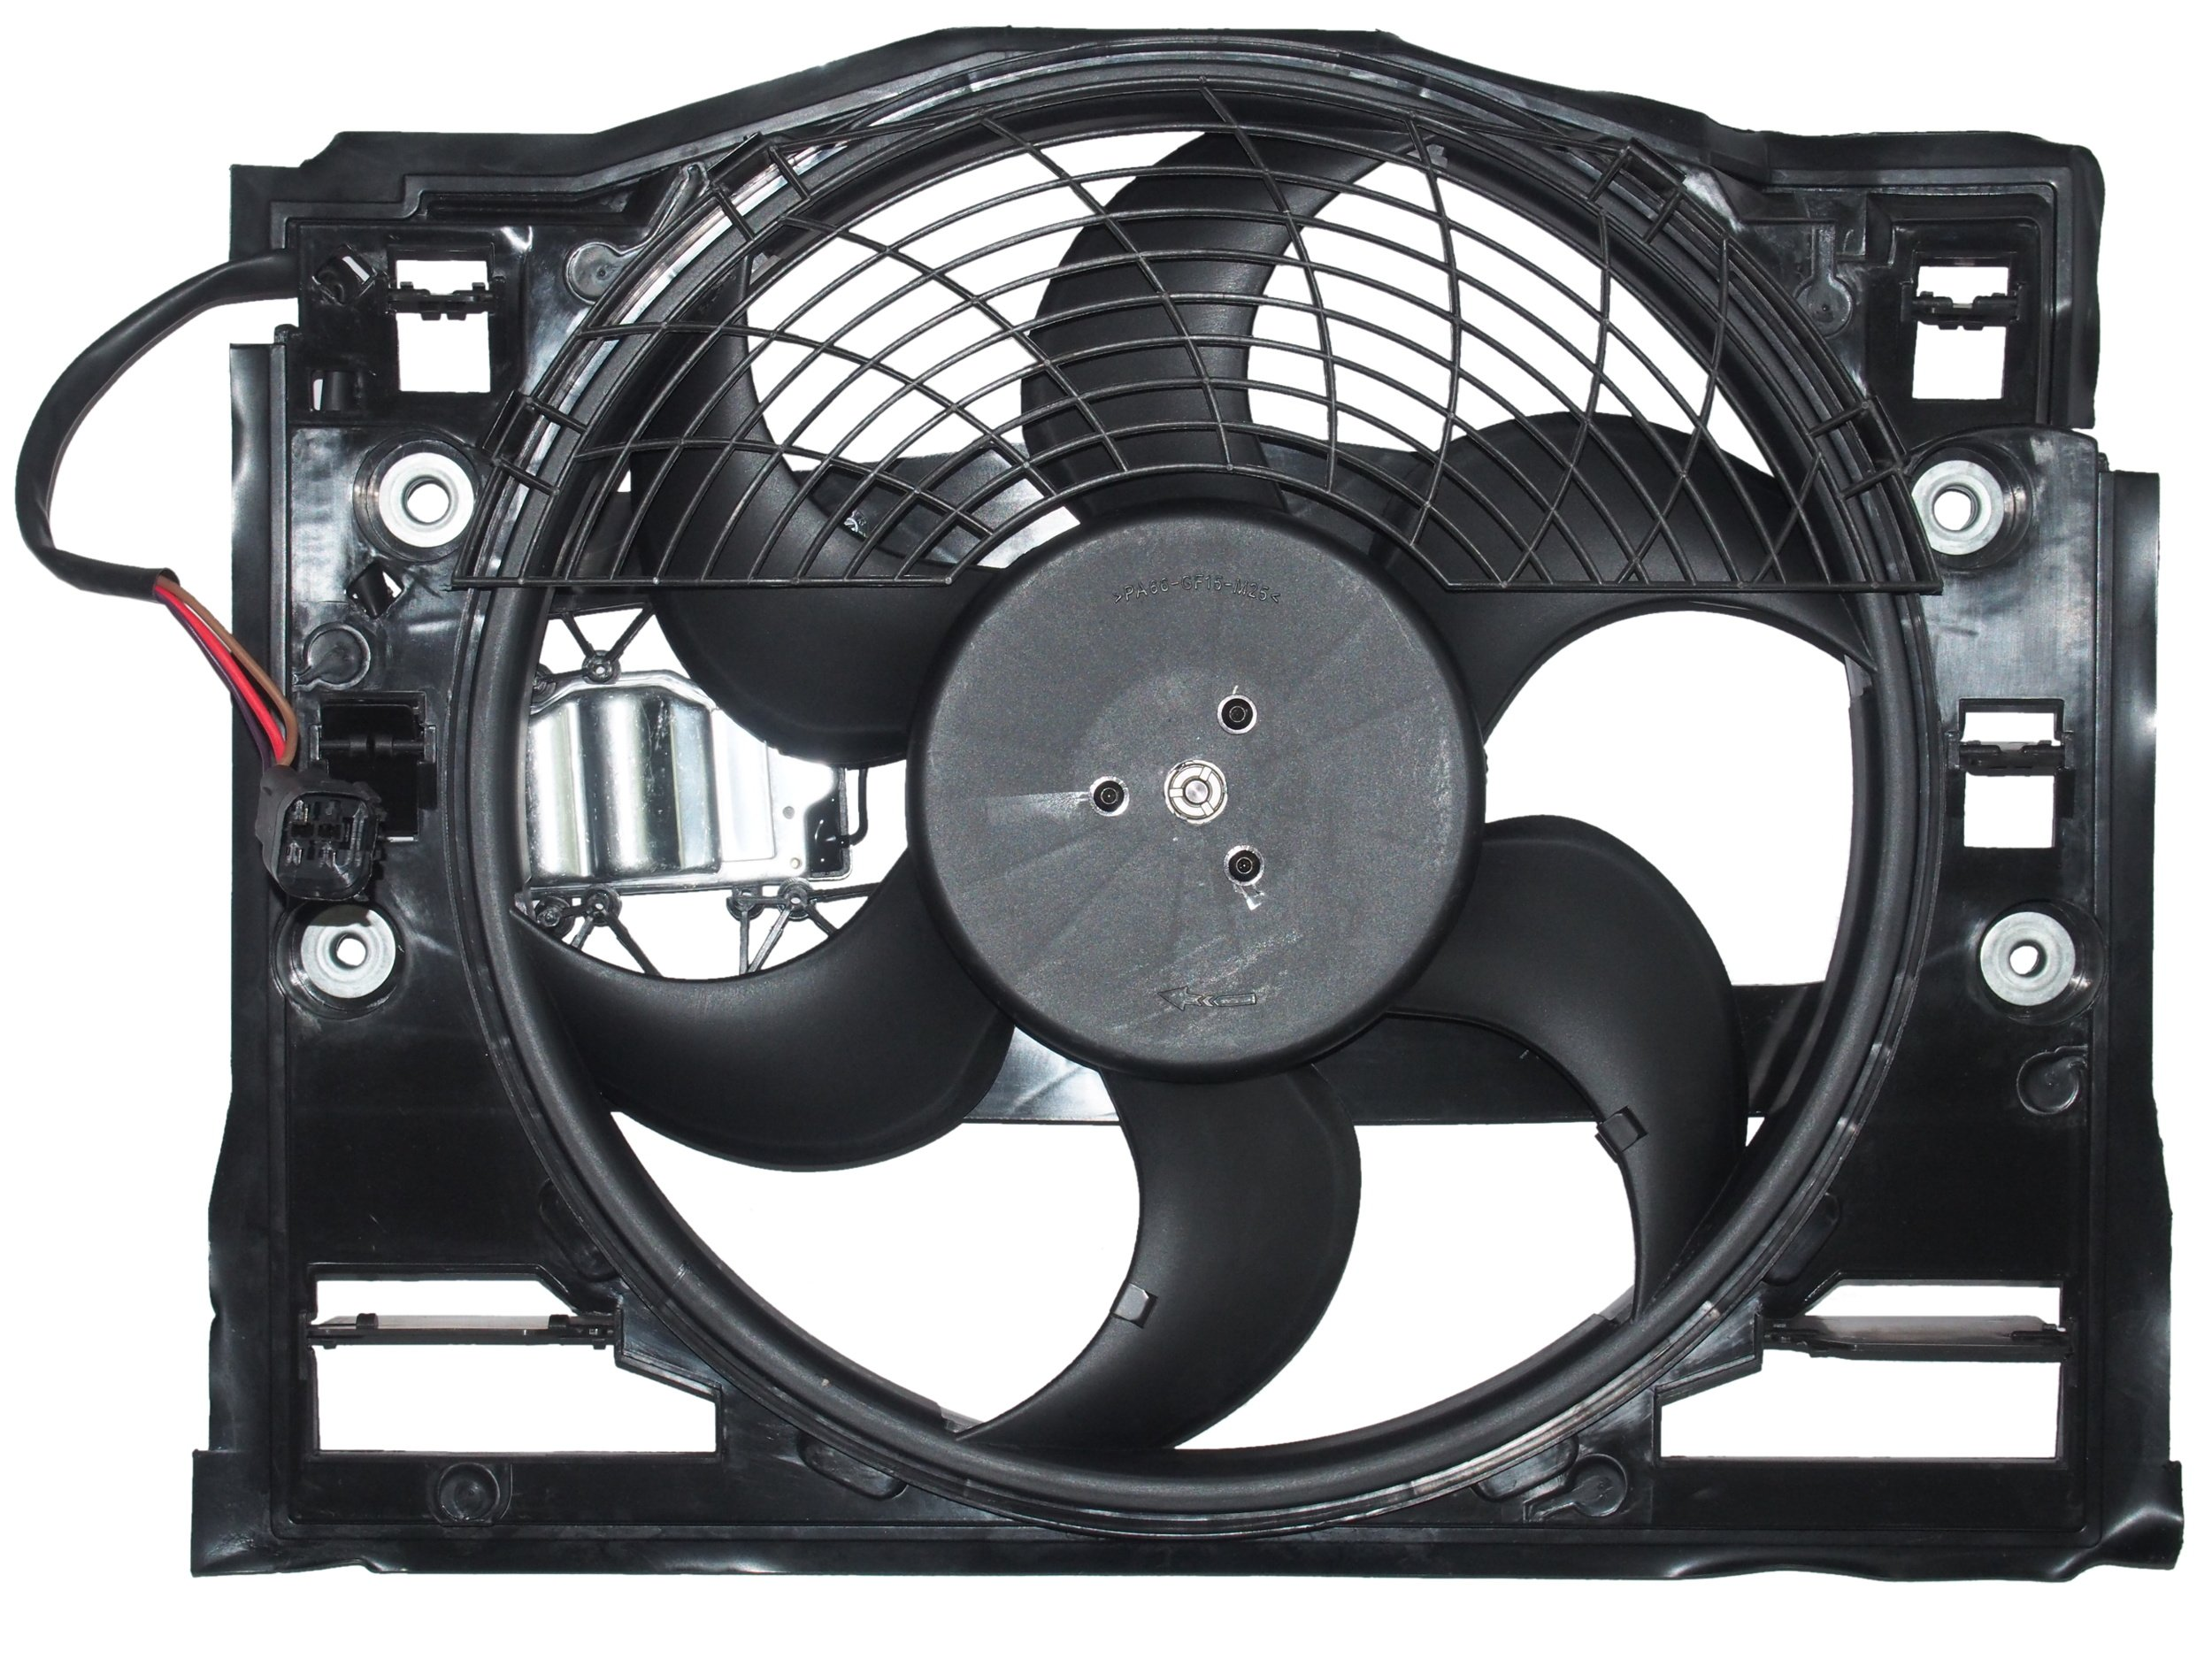 вентилятор кондиционирования воздуха bmw e46 330d 325i 325ci